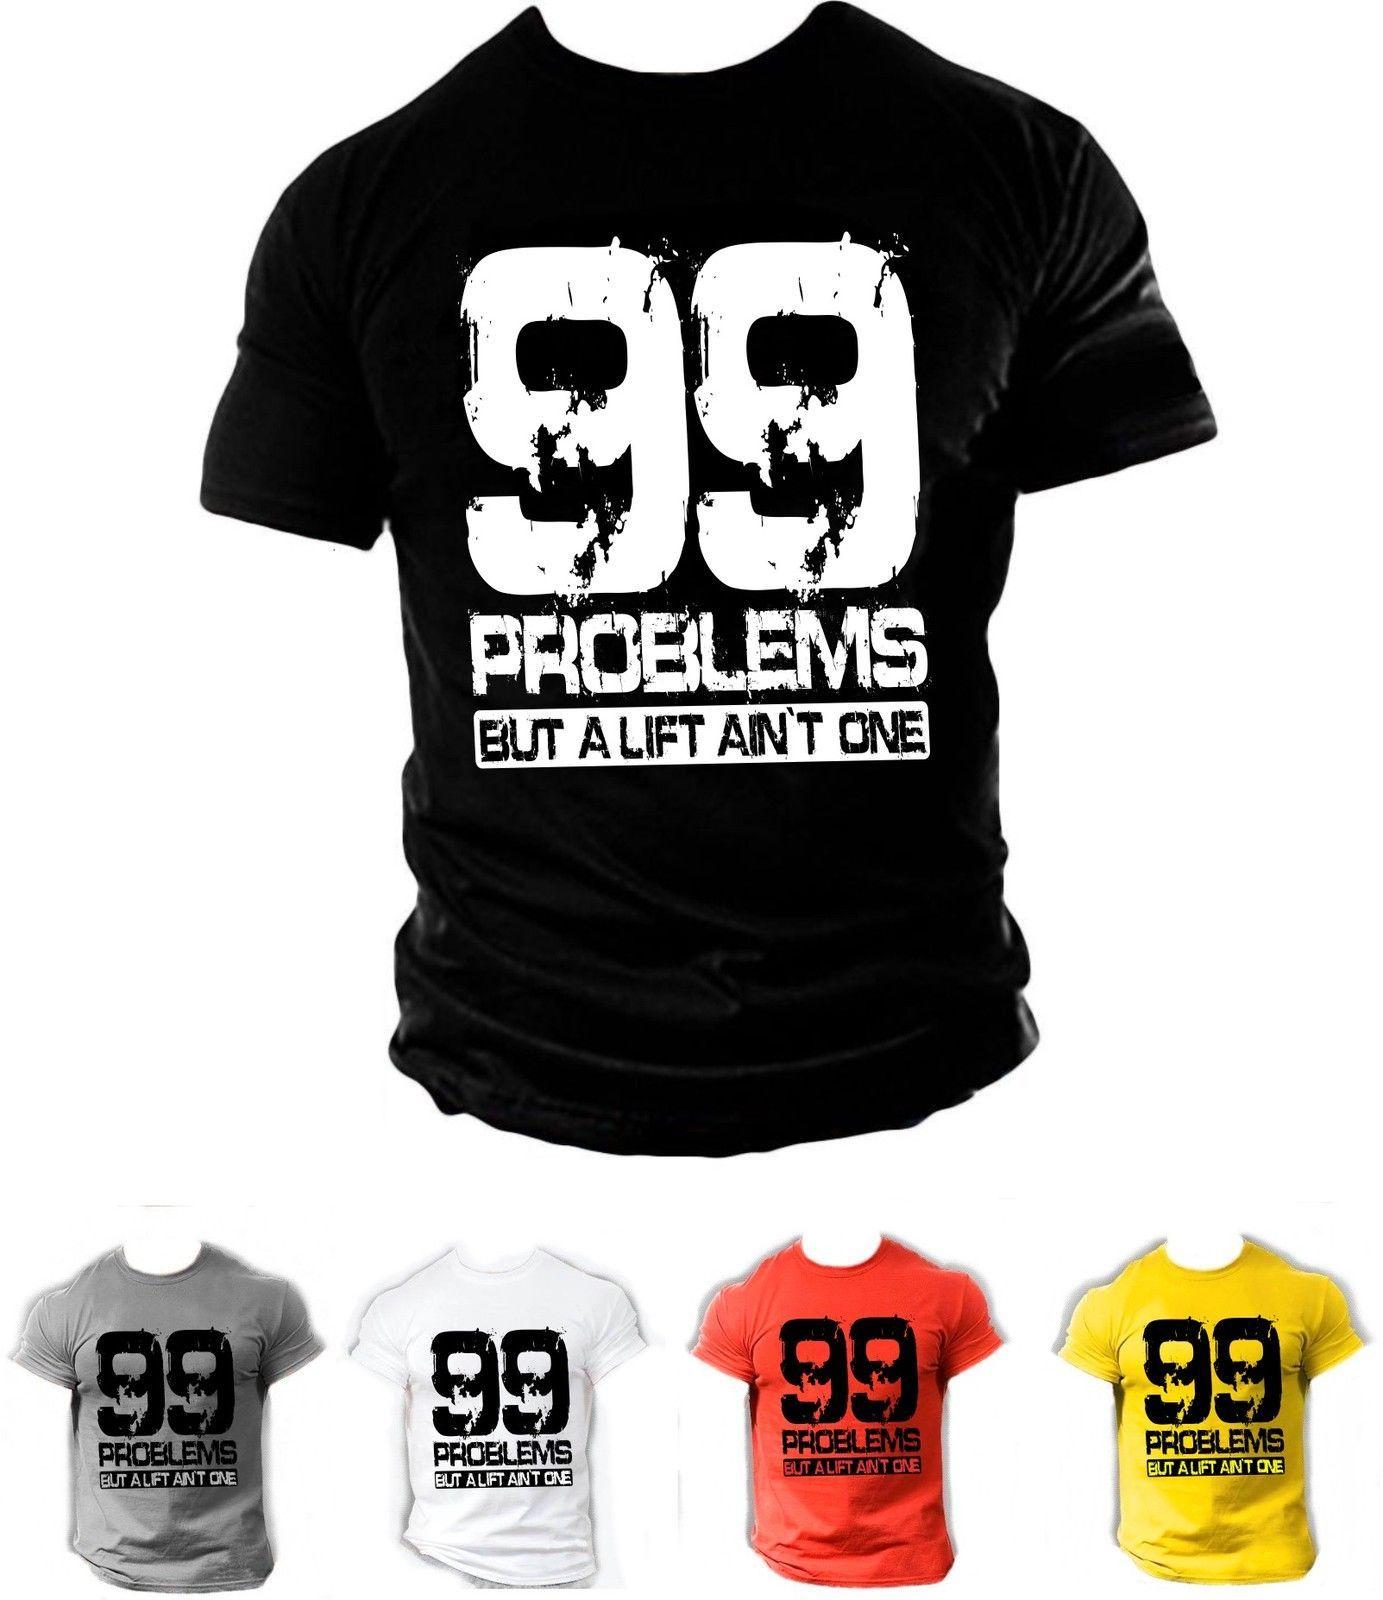 ca9965dd Mens MMA GYM BODYBUILDING MOTIVATION T Shirt BEST WORKOUT CLOTHING TRAINING  TOP Cartoon T Shirt Men T Shirts Funny Great T Shirts From Cls6688522, ...